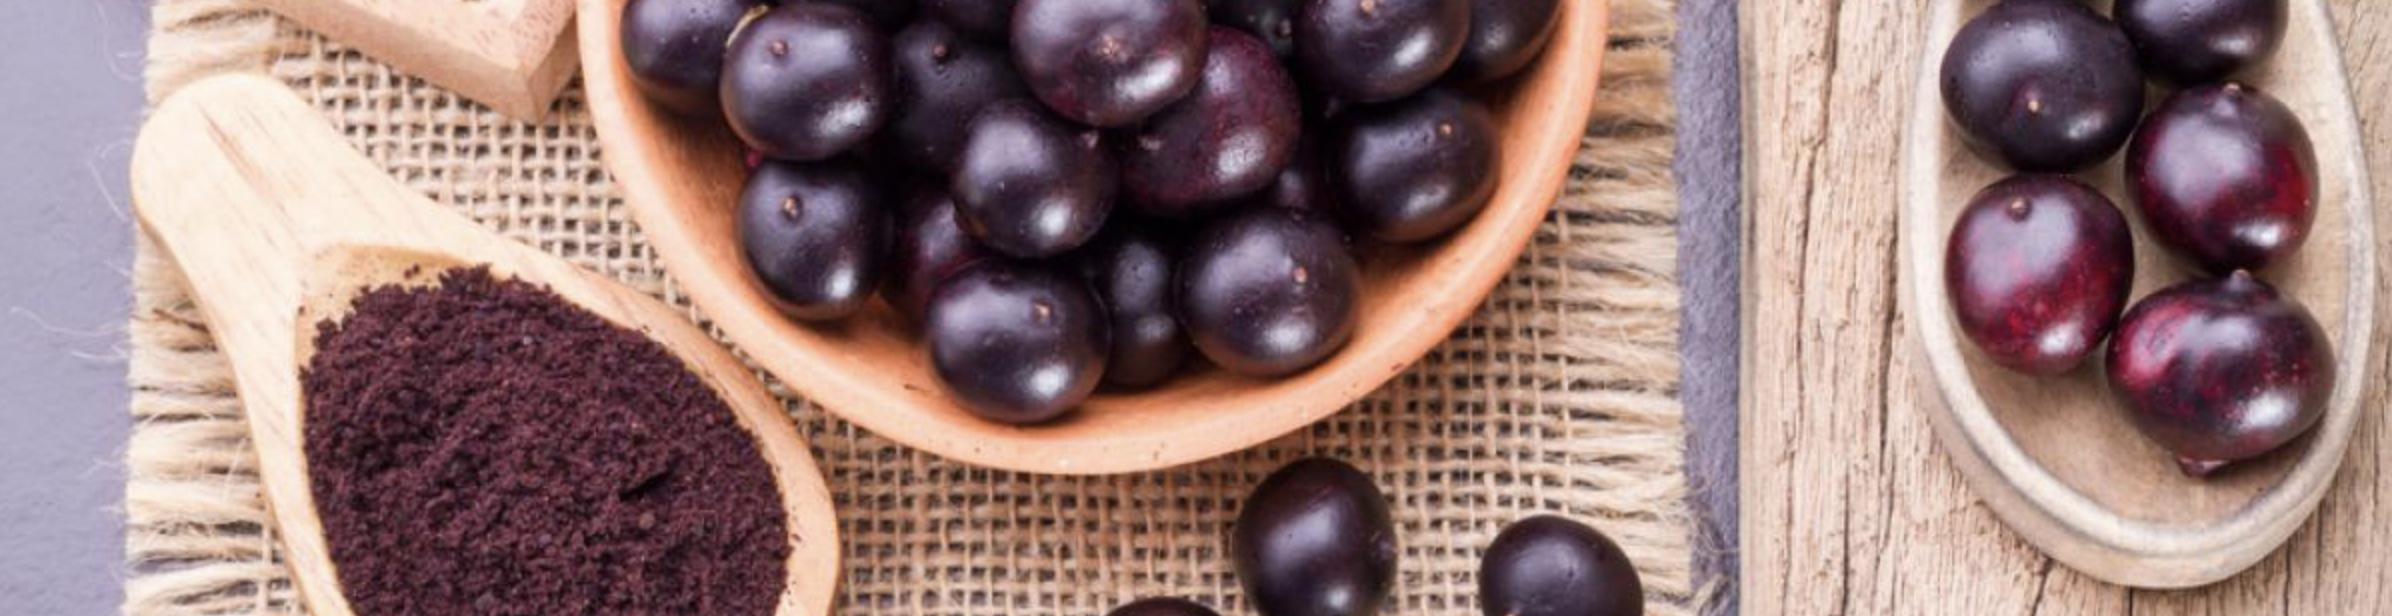 açai,acai,antioxidantes,antiaging,smoothie,zumo.batido,herbolario online,cosmética natural,tratamientos naturales